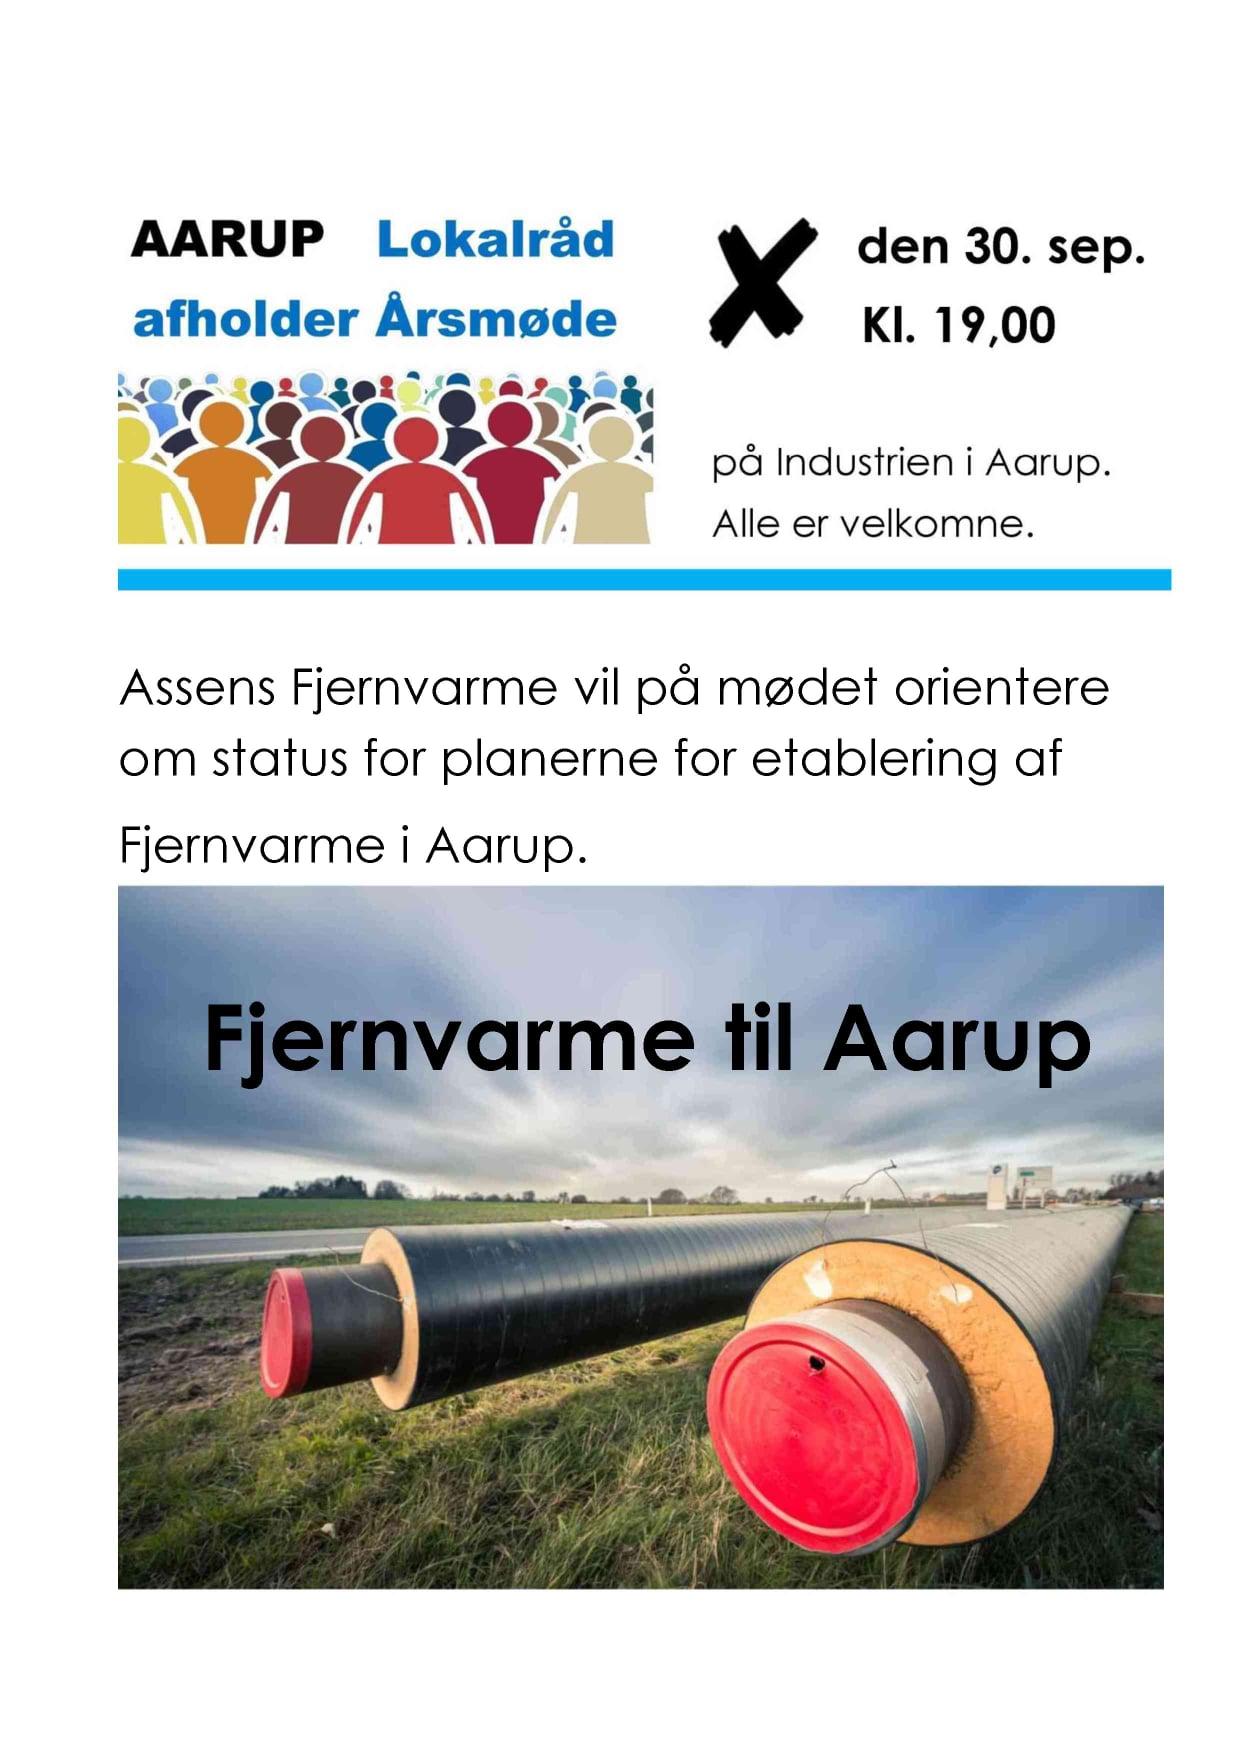 Årsmøde - Aarup Lokalråd @ Industrien